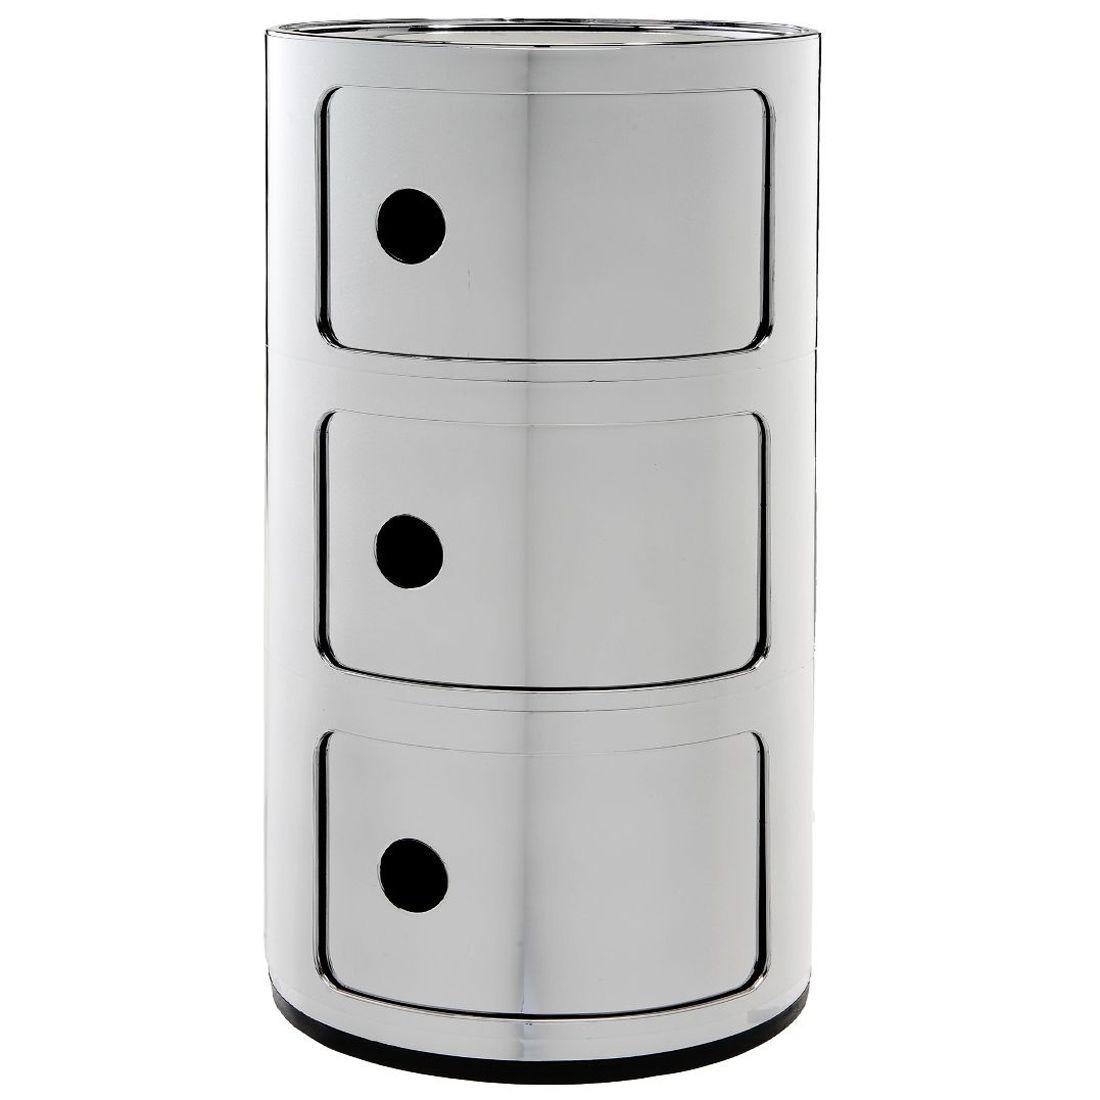 Kartell Componibili bijzettafel metallic (3 comp.) chroom 32